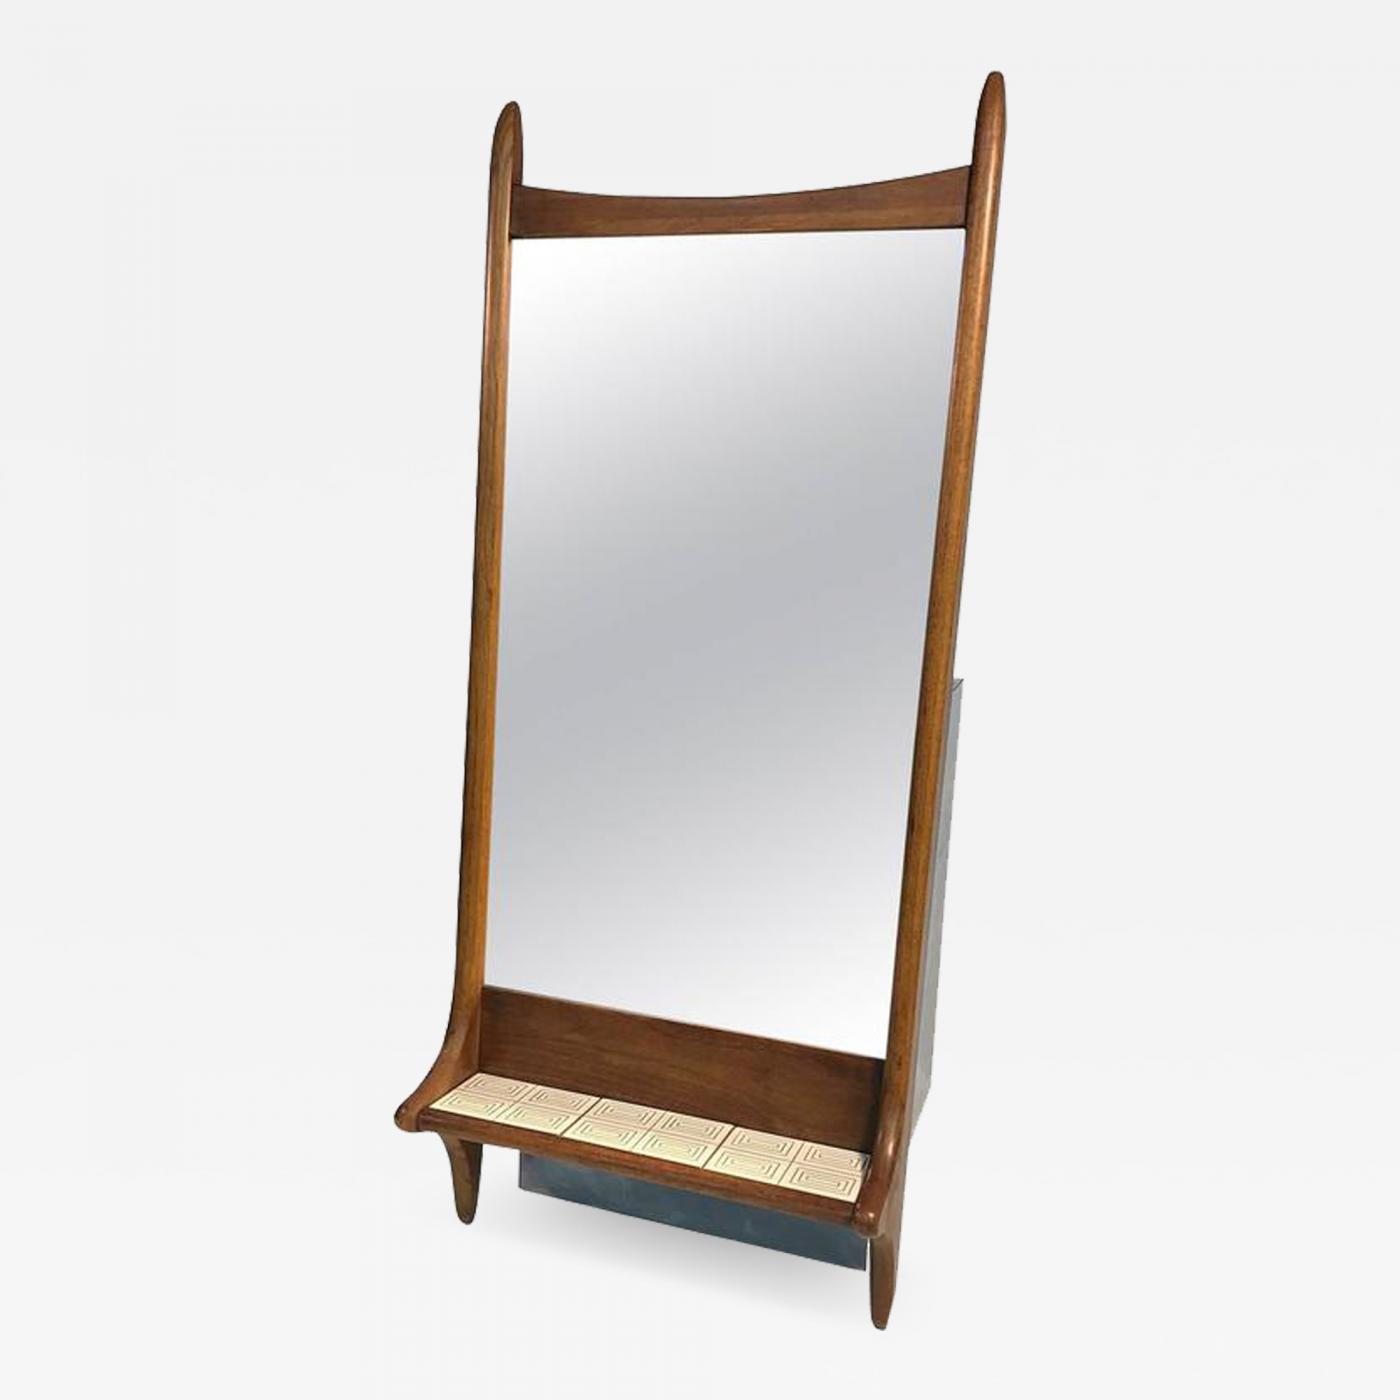 Vladimir Kagan Vladimir Kagan Style Sculptural Mid Century Modern Mirror With Tile Shelf